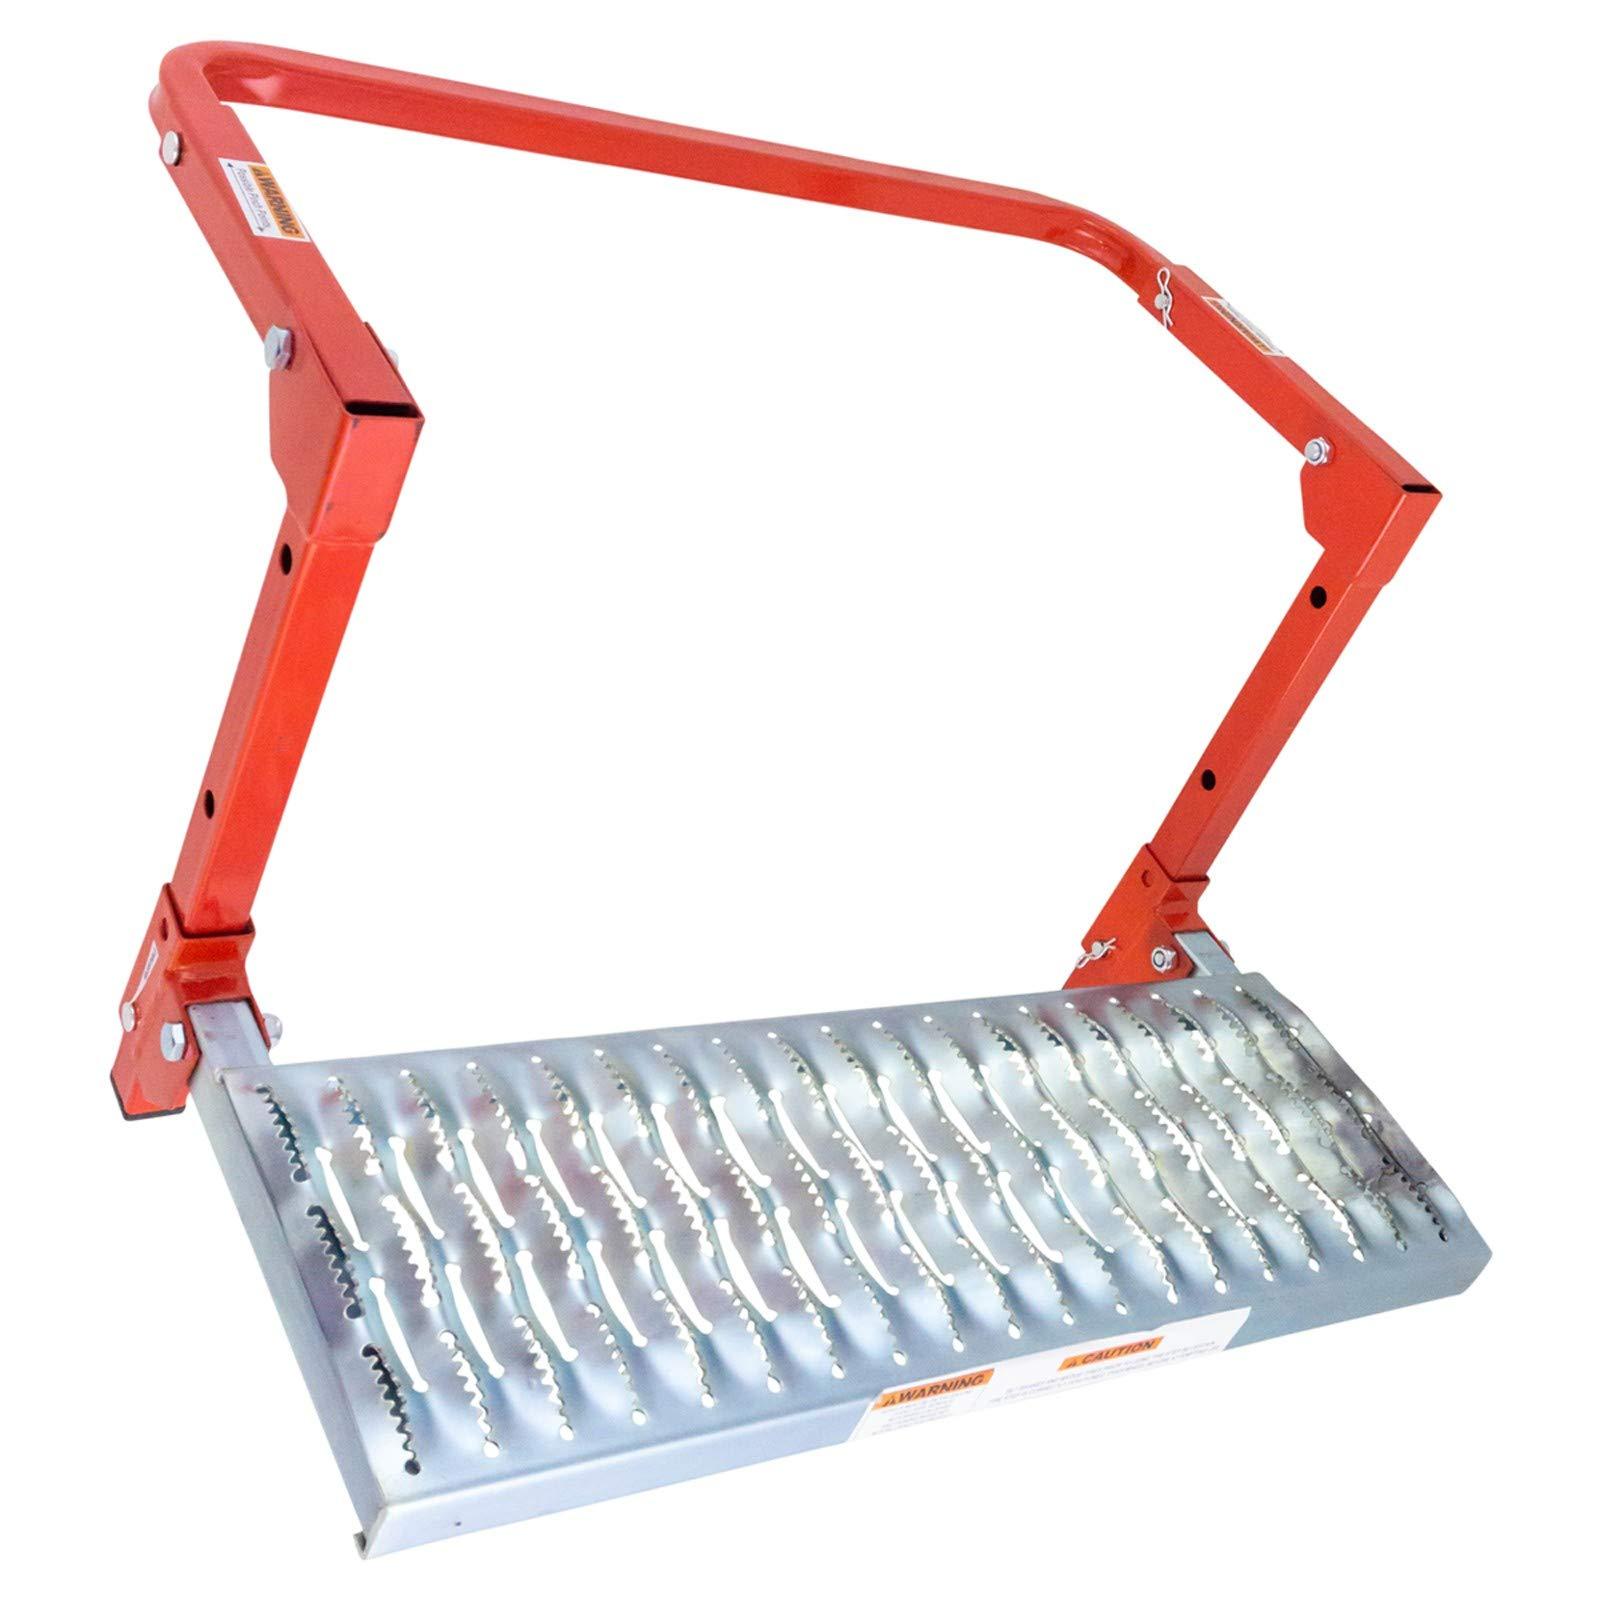 Adjustable Wheel Step 300lb Capacity Non-slip Surface Folding Work Platform